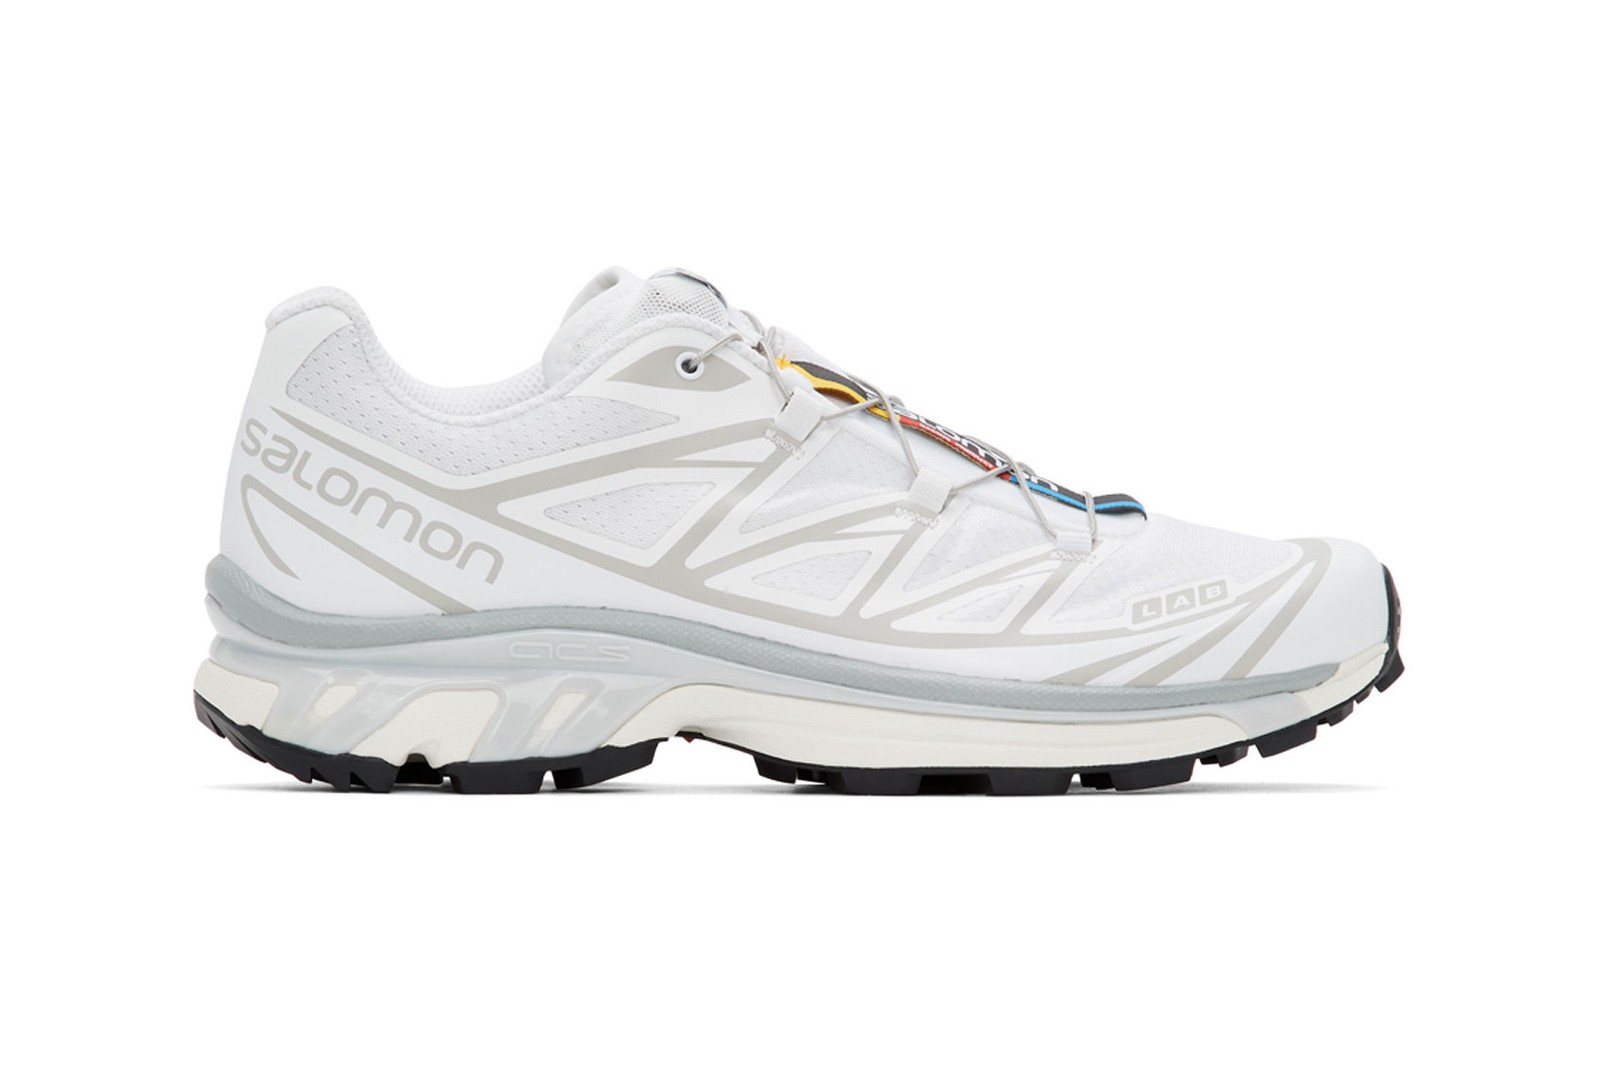 best spring winter womens sneakers adidas originals nike asics air jordan 11 daybreak cortez golf